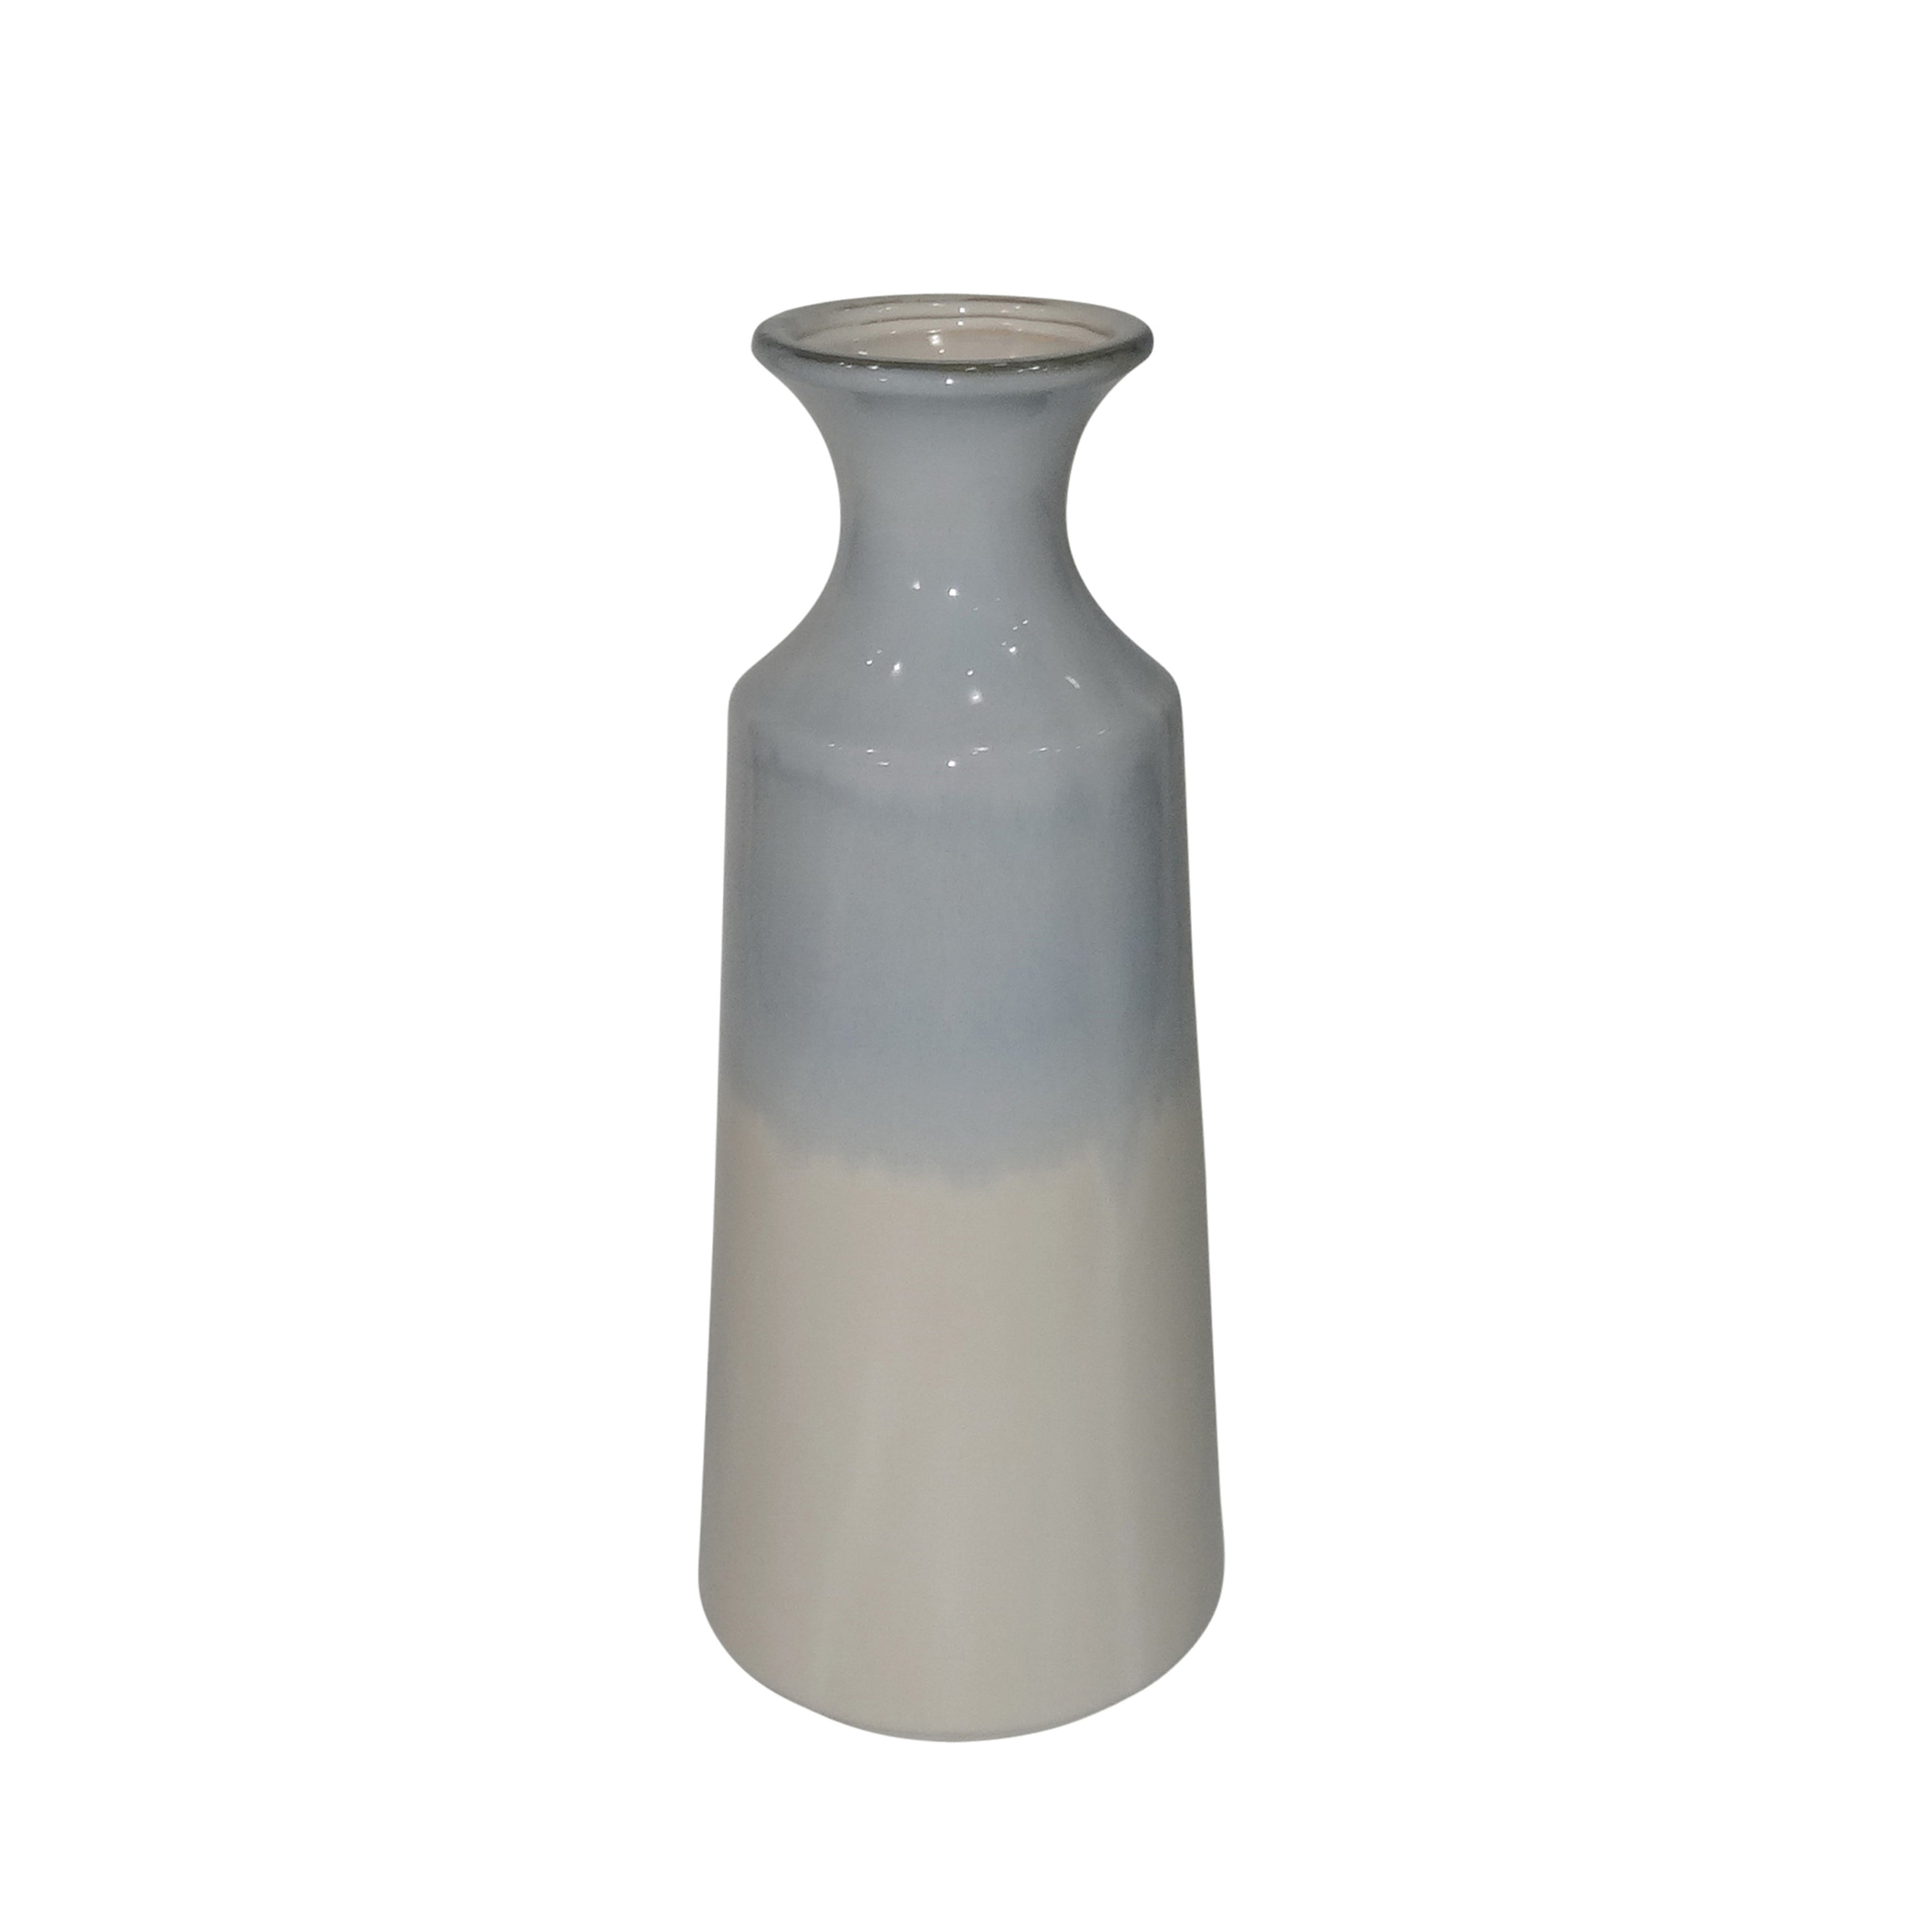 Dual Tone Ceramic Decorative Vase with Round Flared Opening, Blue and White